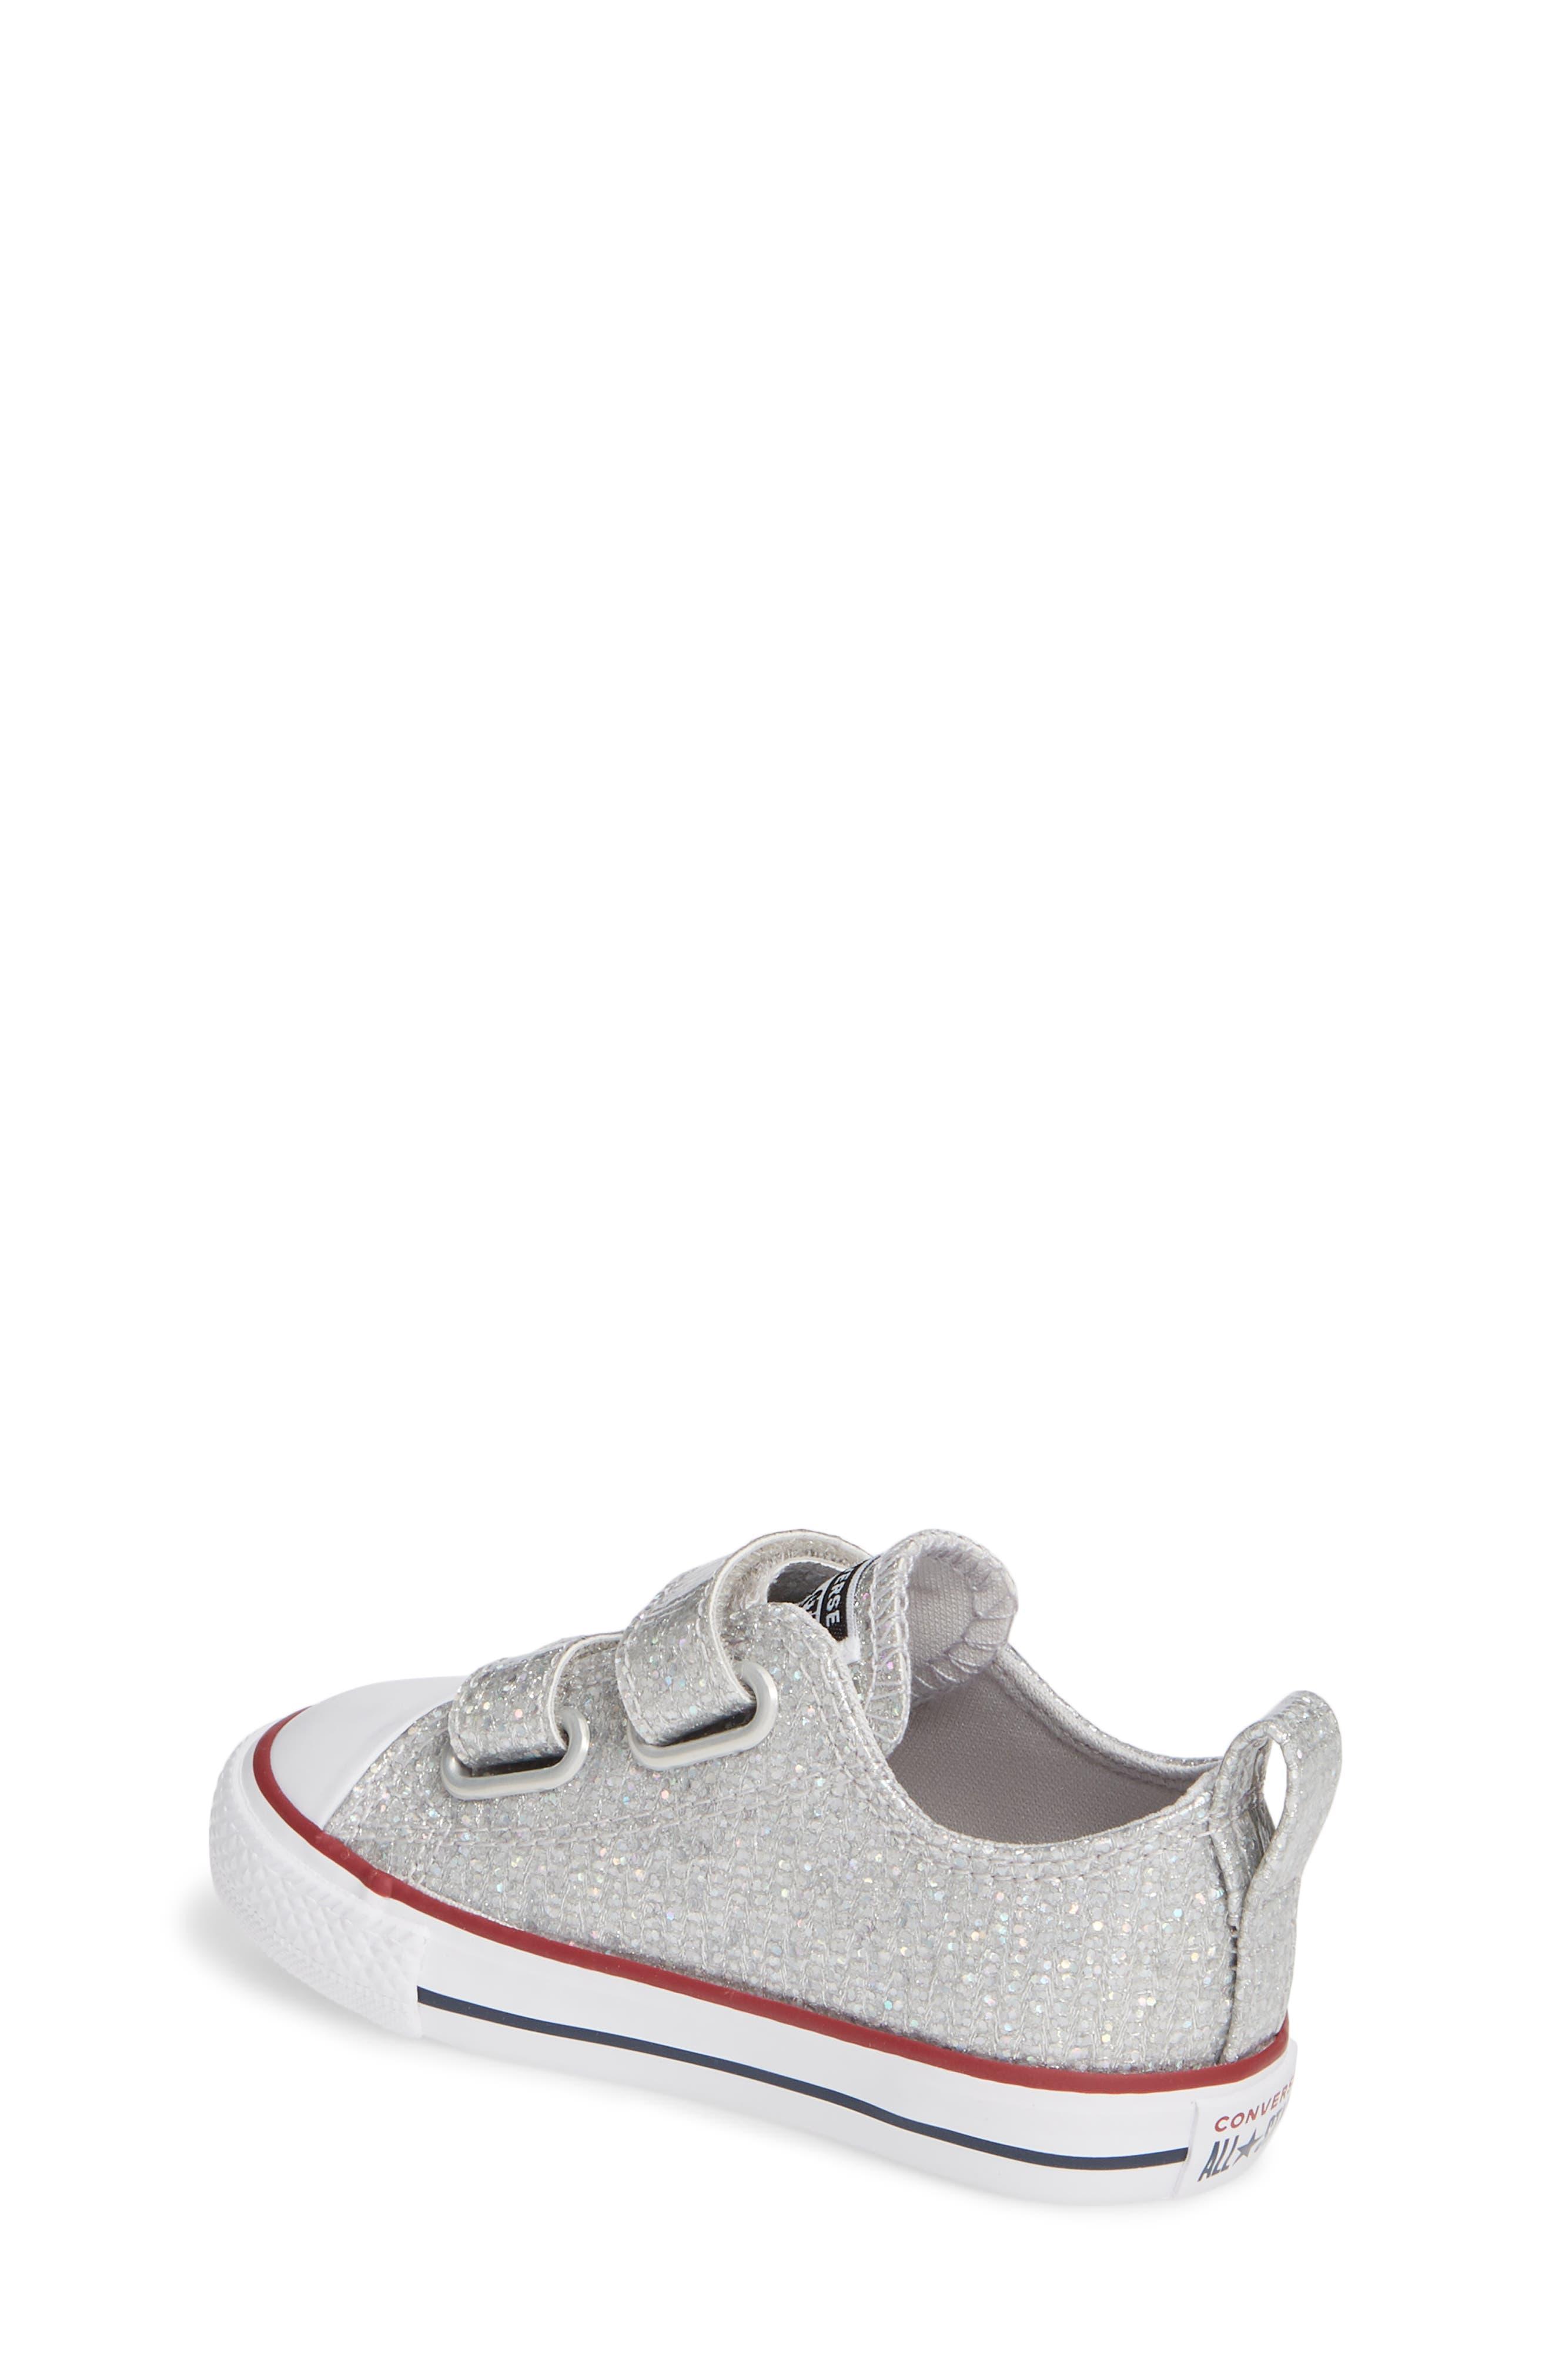 All Star<sup>®</sup> Seasonal Glitter Sneaker,                             Alternate thumbnail 2, color,                             050